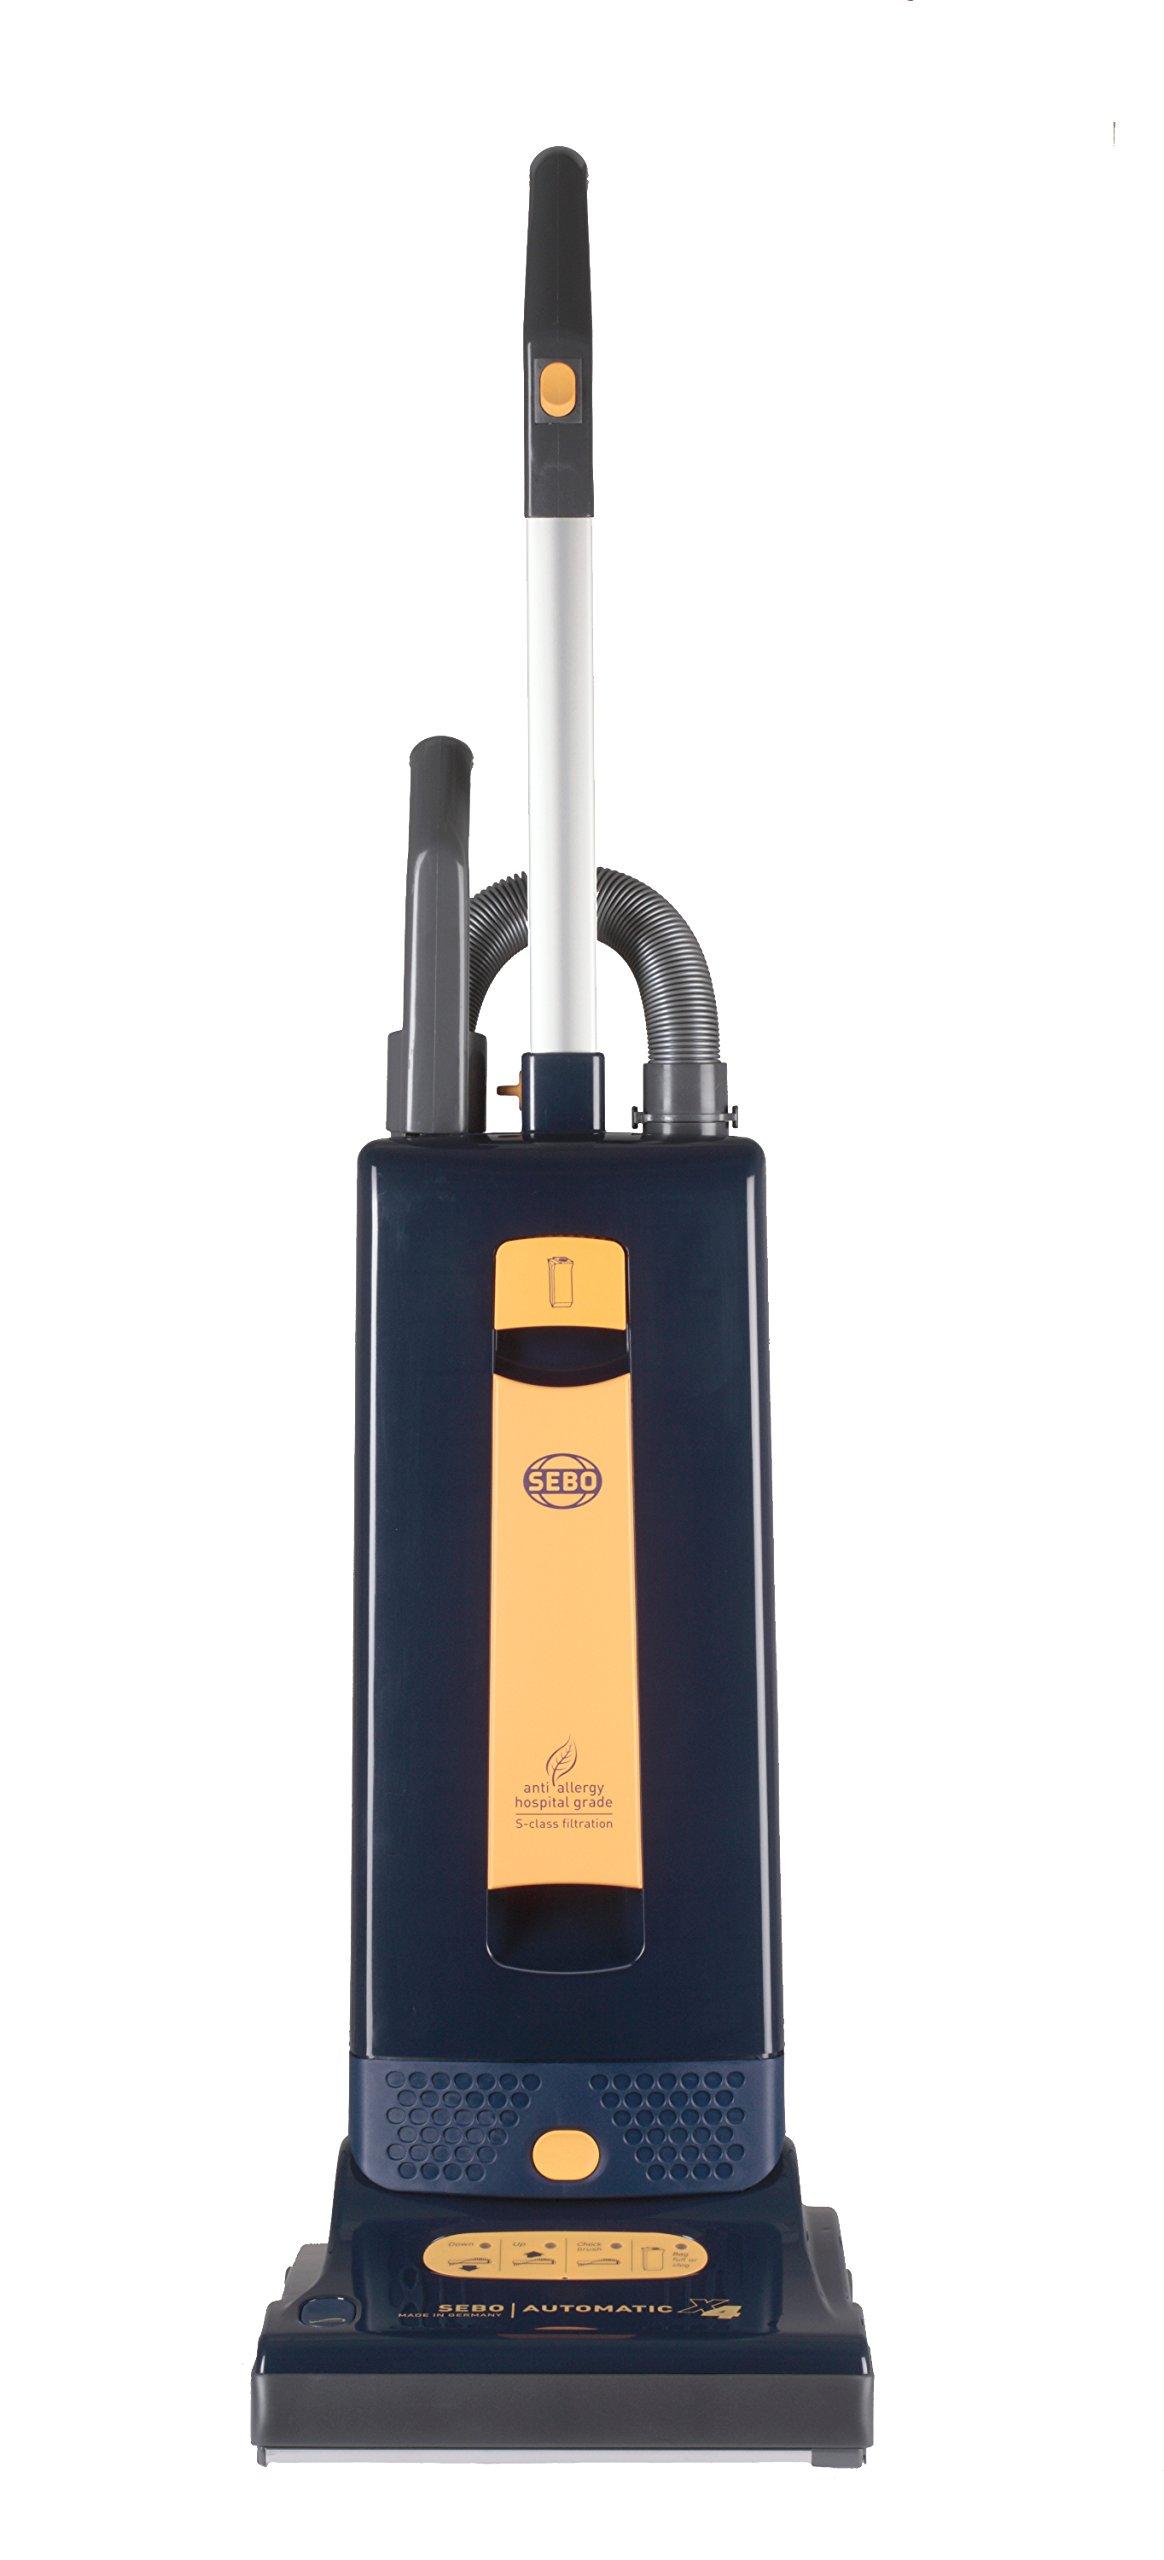 sebo automatic x4 extra eco vacuum cleaner 1100 w ebay. Black Bedroom Furniture Sets. Home Design Ideas